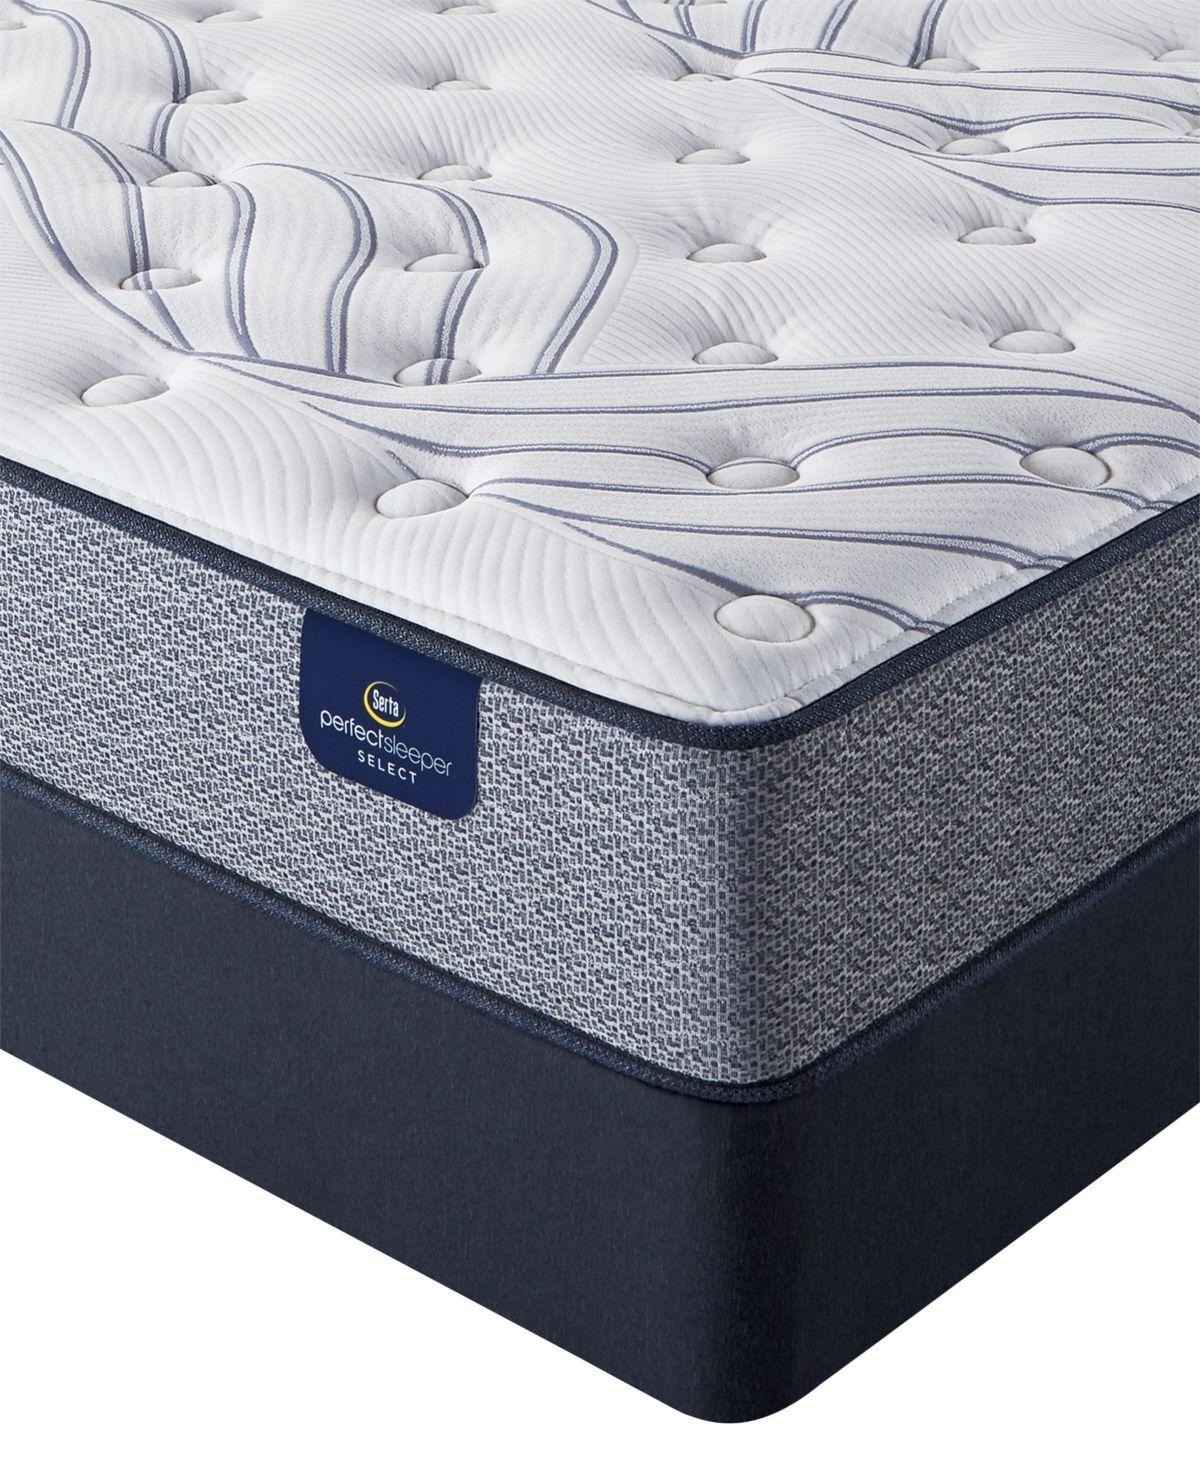 Serta Perfect Sleeper Kleinmon Ii 11 Firm Mattress Set Queen